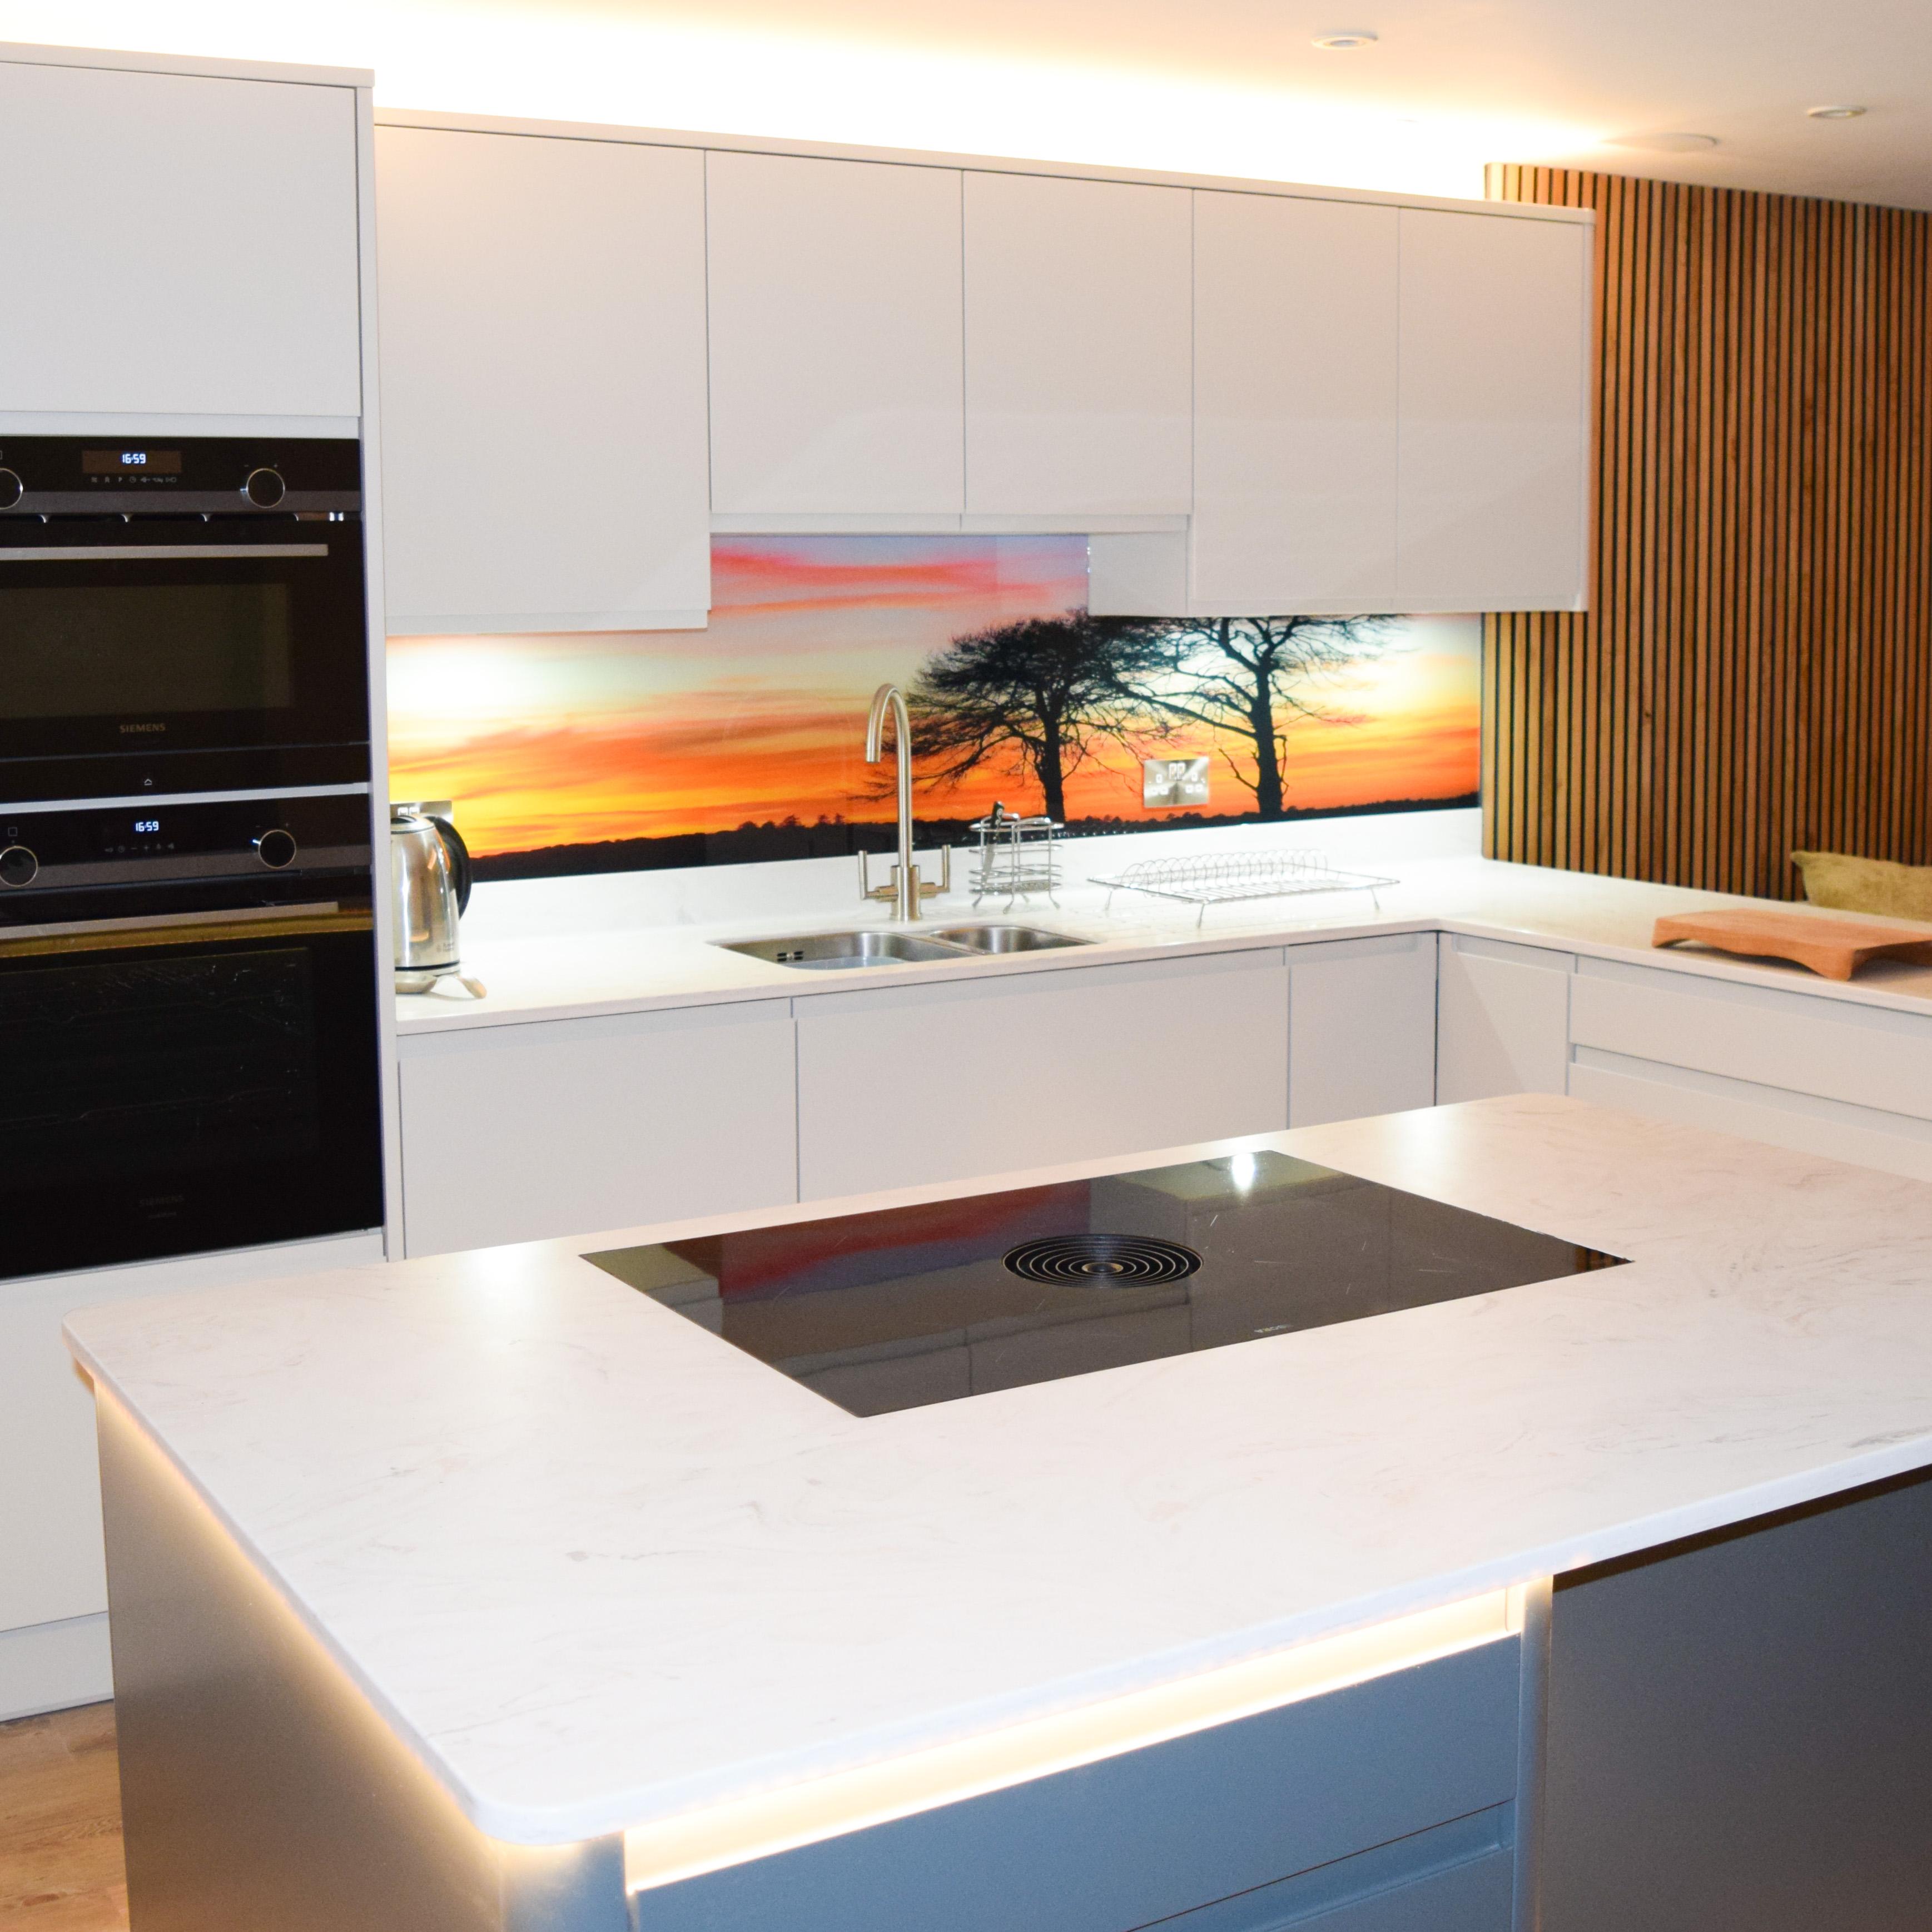 Hedge-End kitchen with bespoke glass splashback